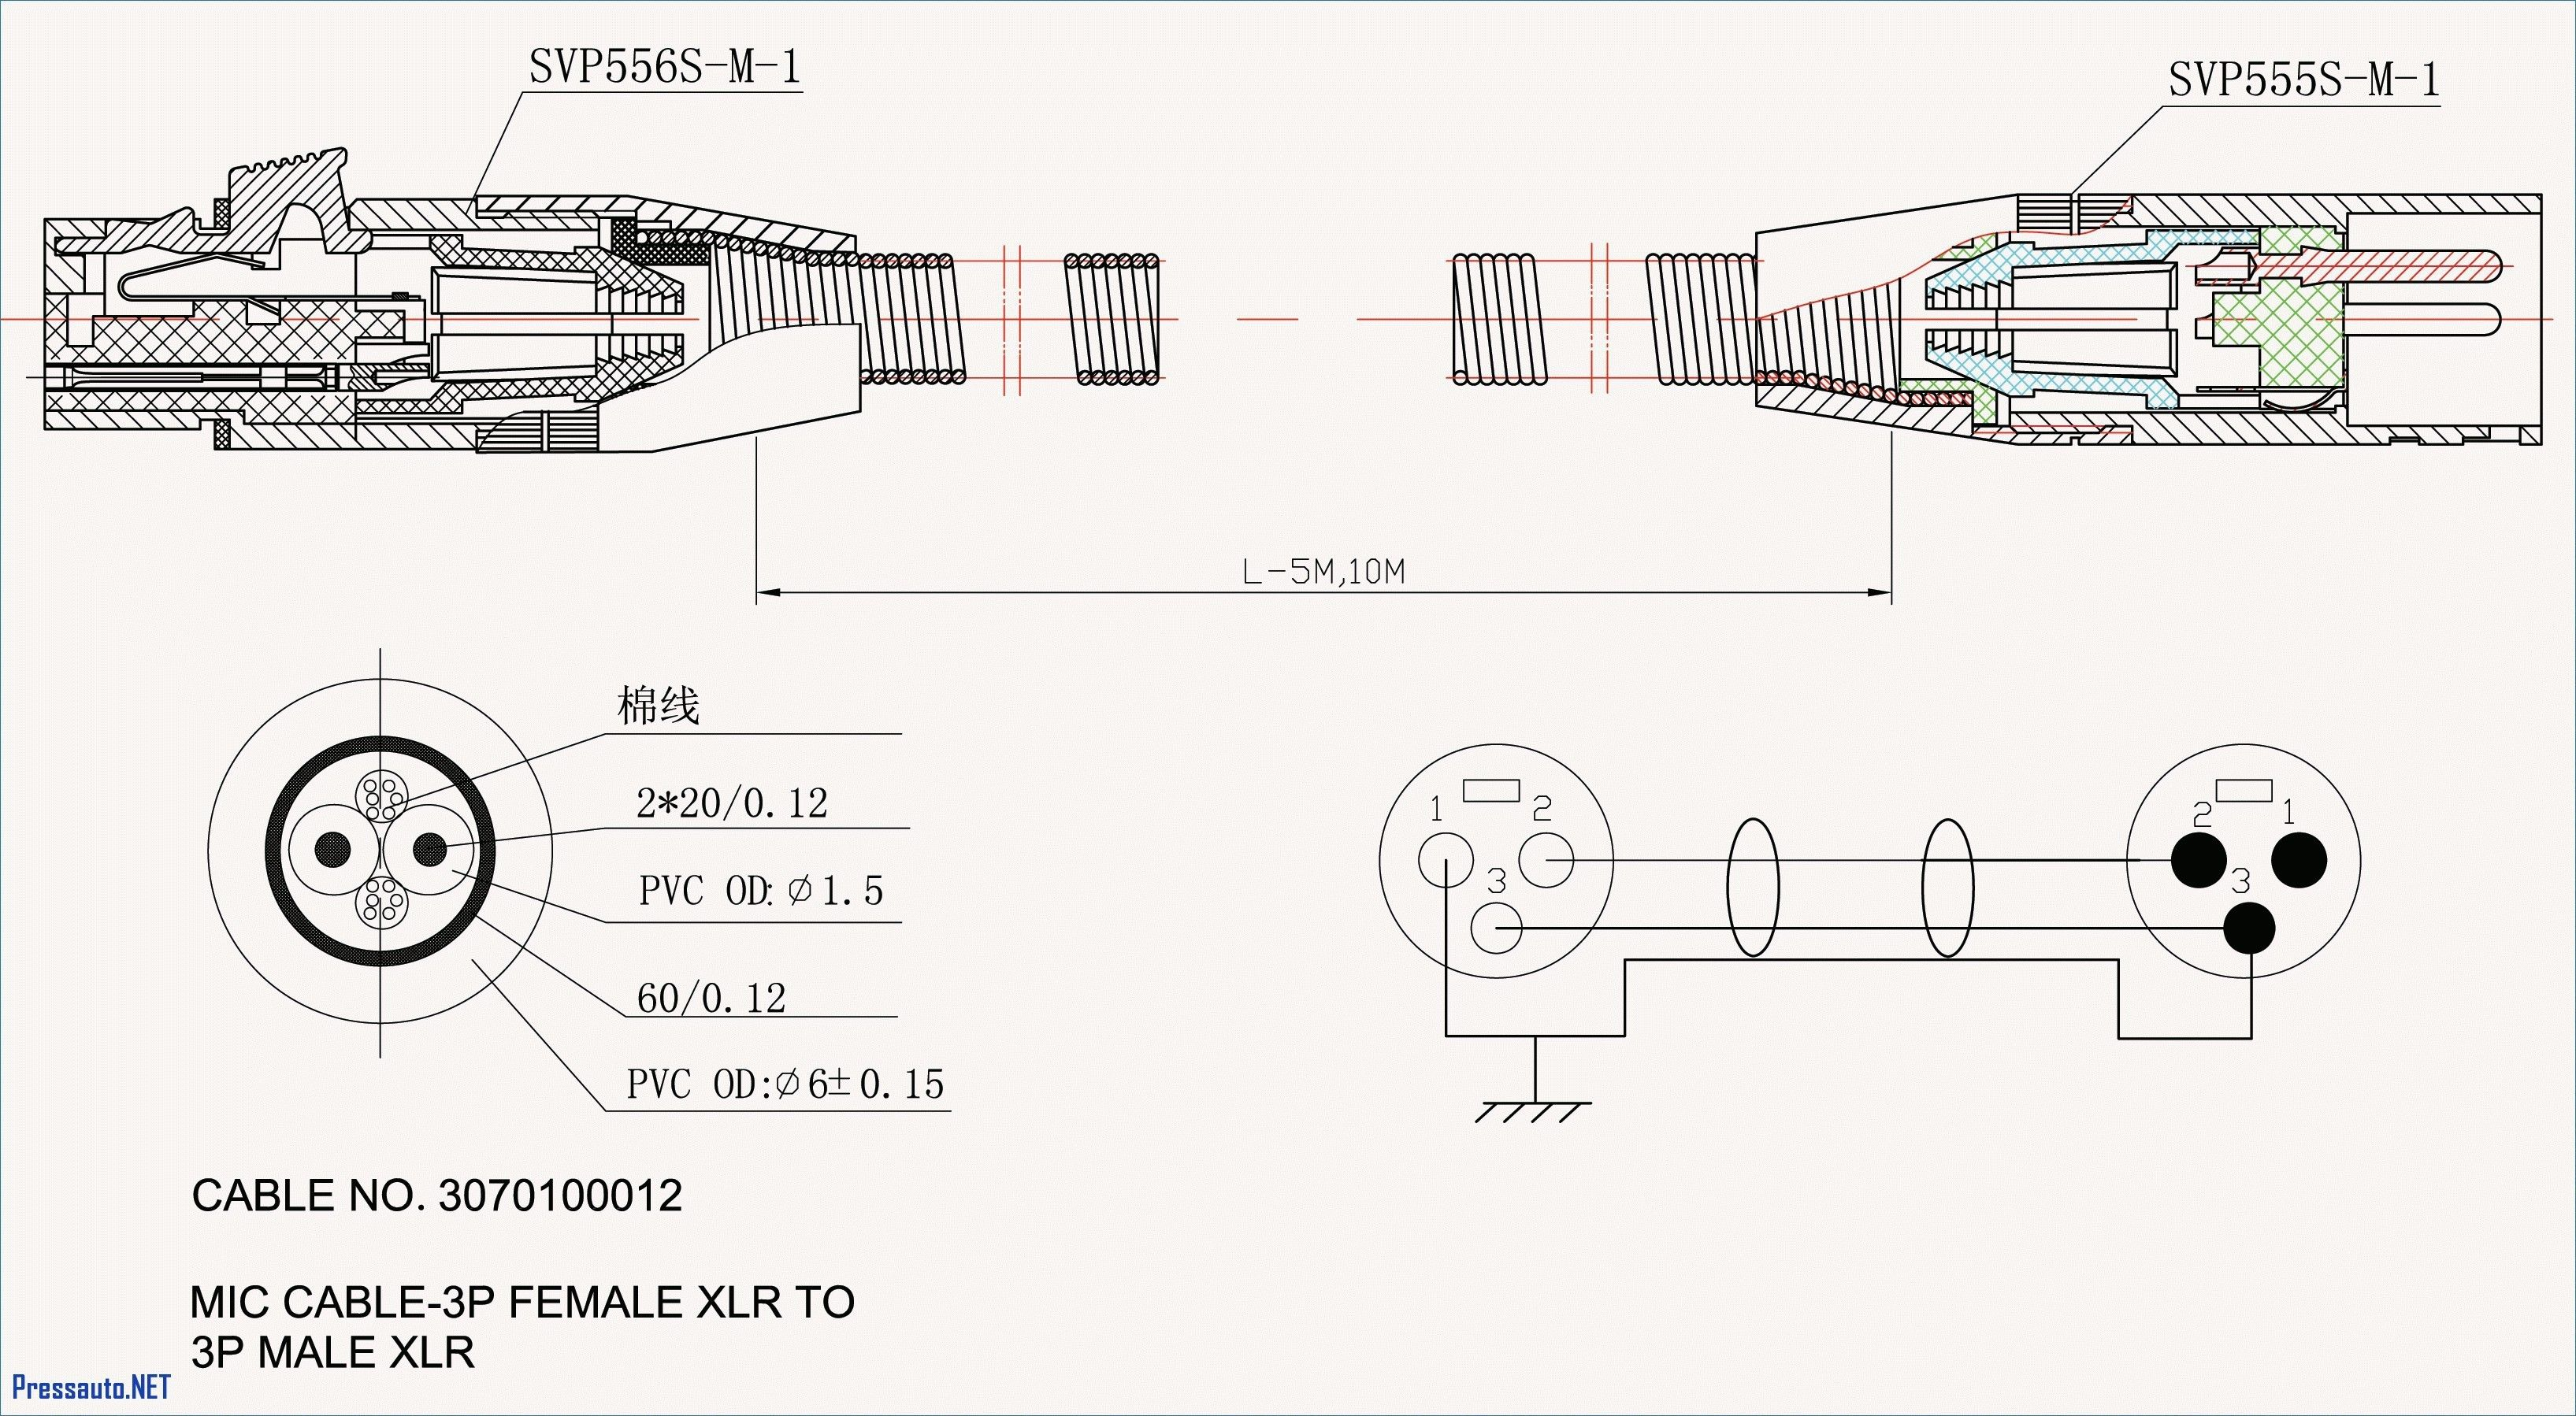 Best Of Breaker Panel Wiring Diagram In 2020 Garage Design Electrical Wiring Diagram Trailer Wiring Diagram